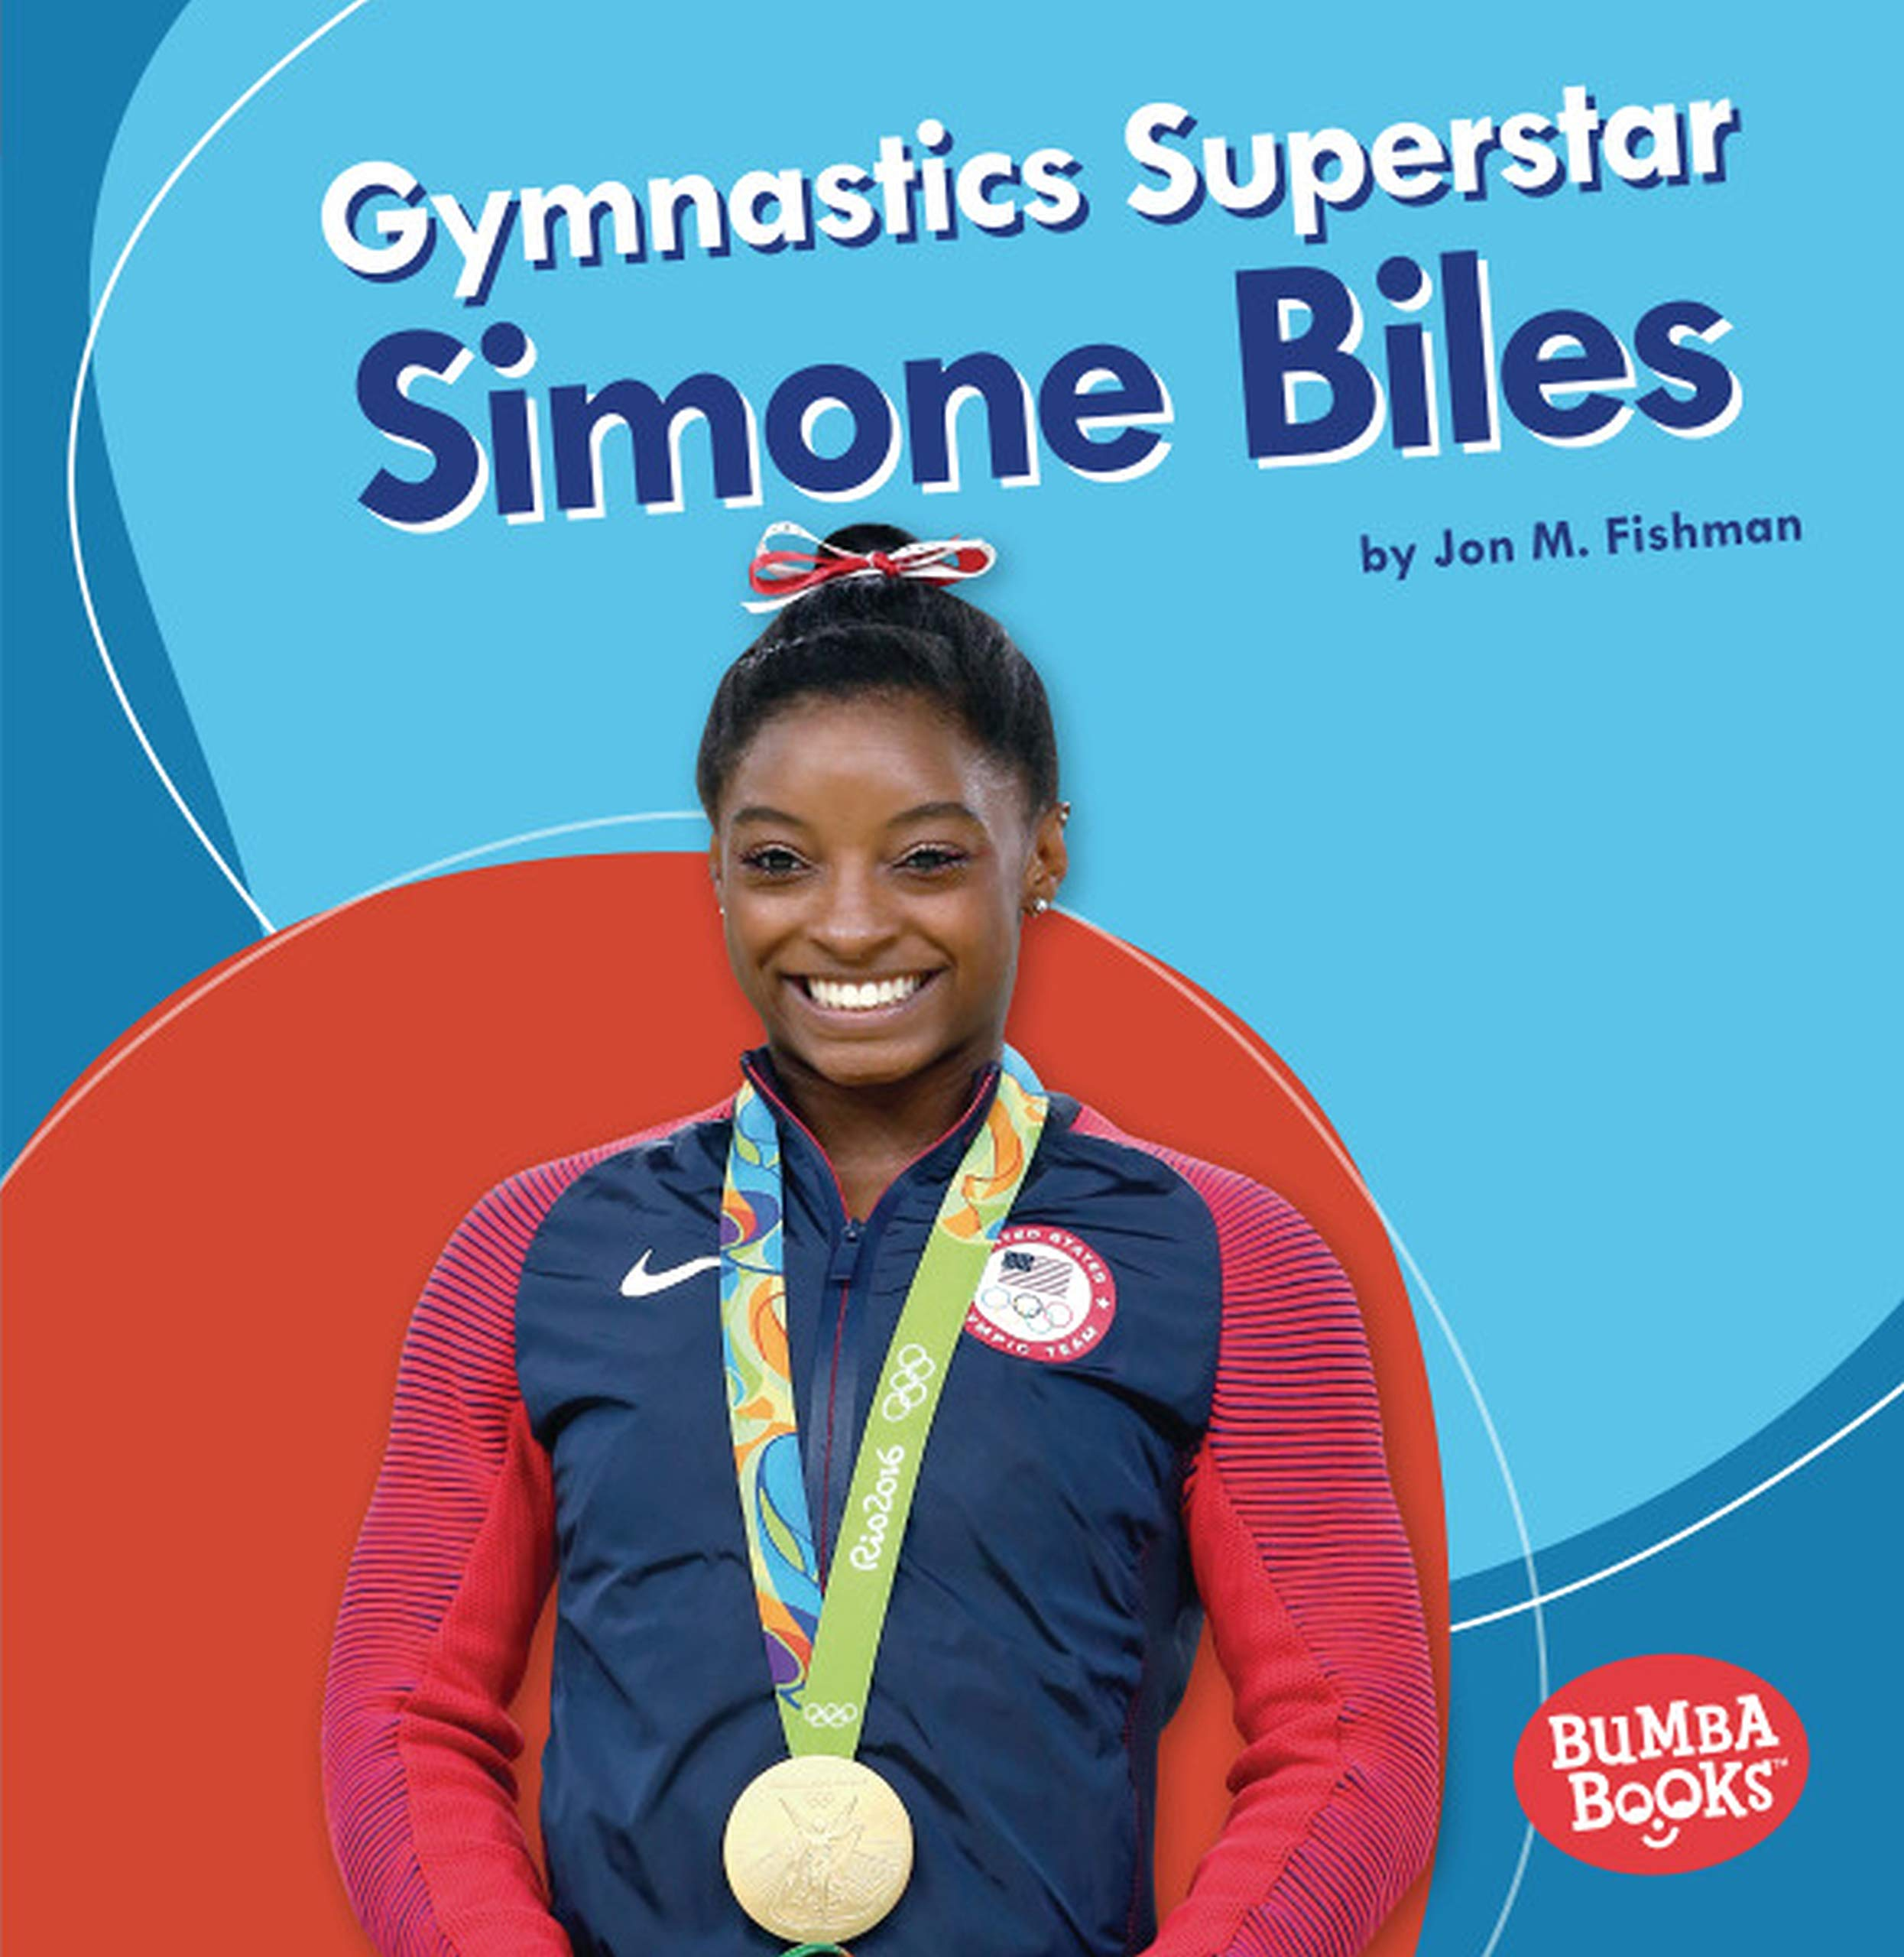 Gymnastics Superstar Simone Biles  Bumba Books  Sports Superstars